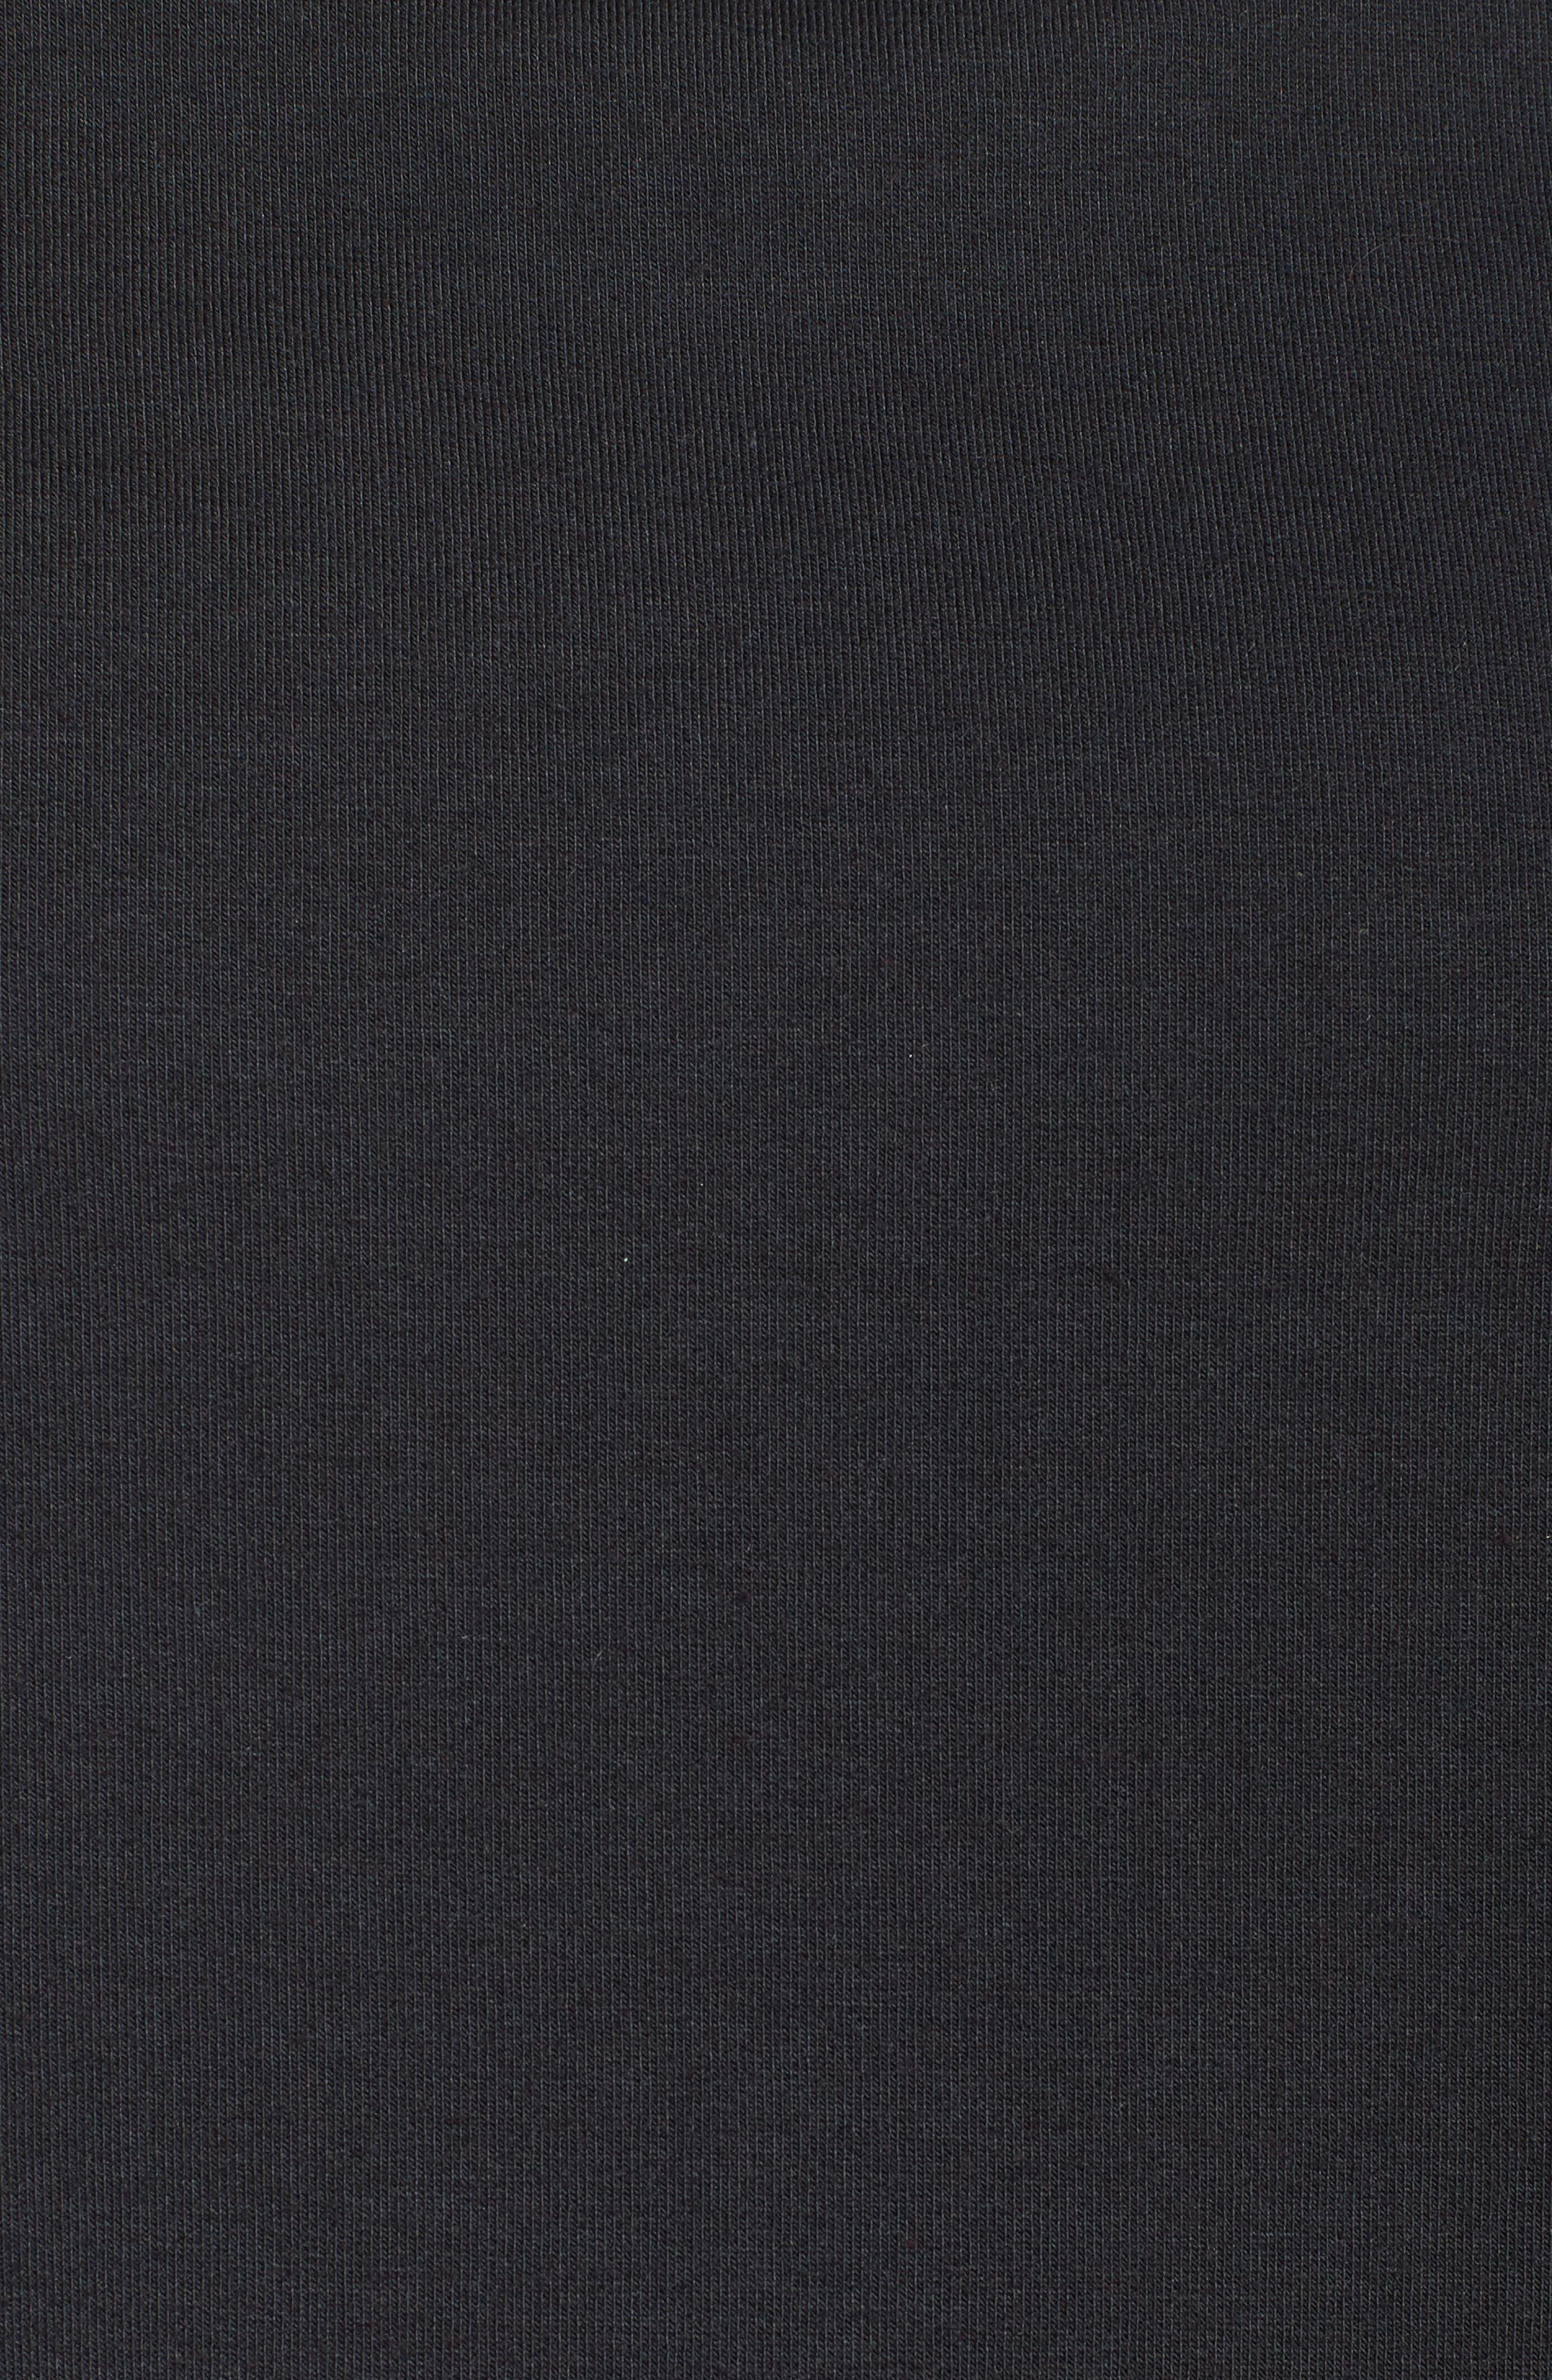 Uplift Modal Blend Top,                             Alternate thumbnail 6, color,                             Black